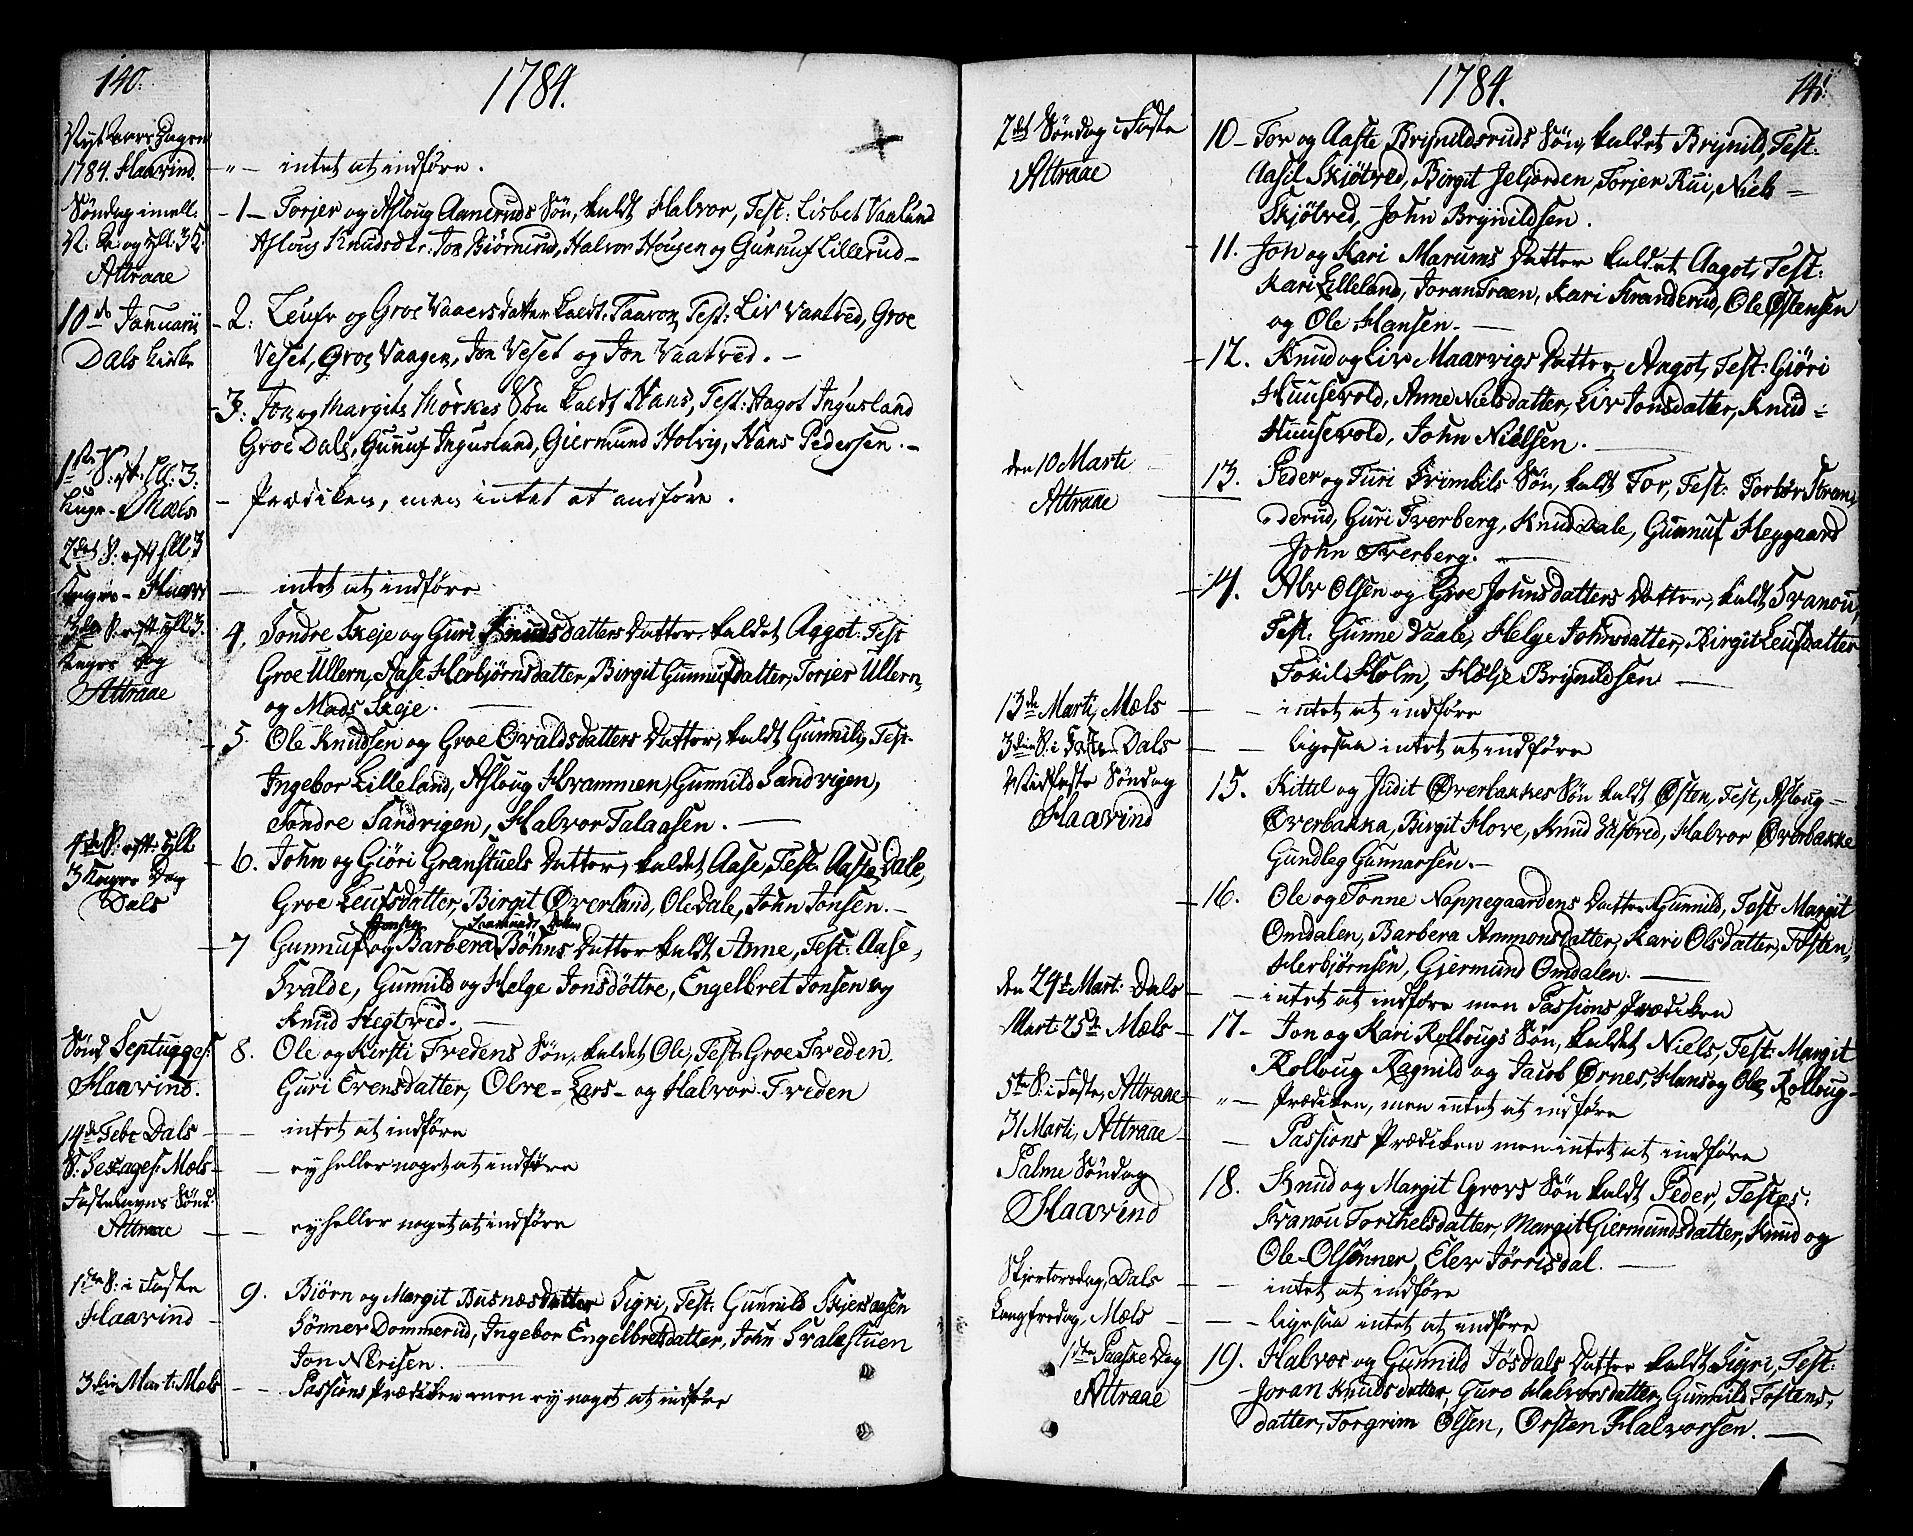 SAKO, Tinn kirkebøker, F/Fa/L0002: Ministerialbok nr. I 2, 1757-1810, s. 140-141